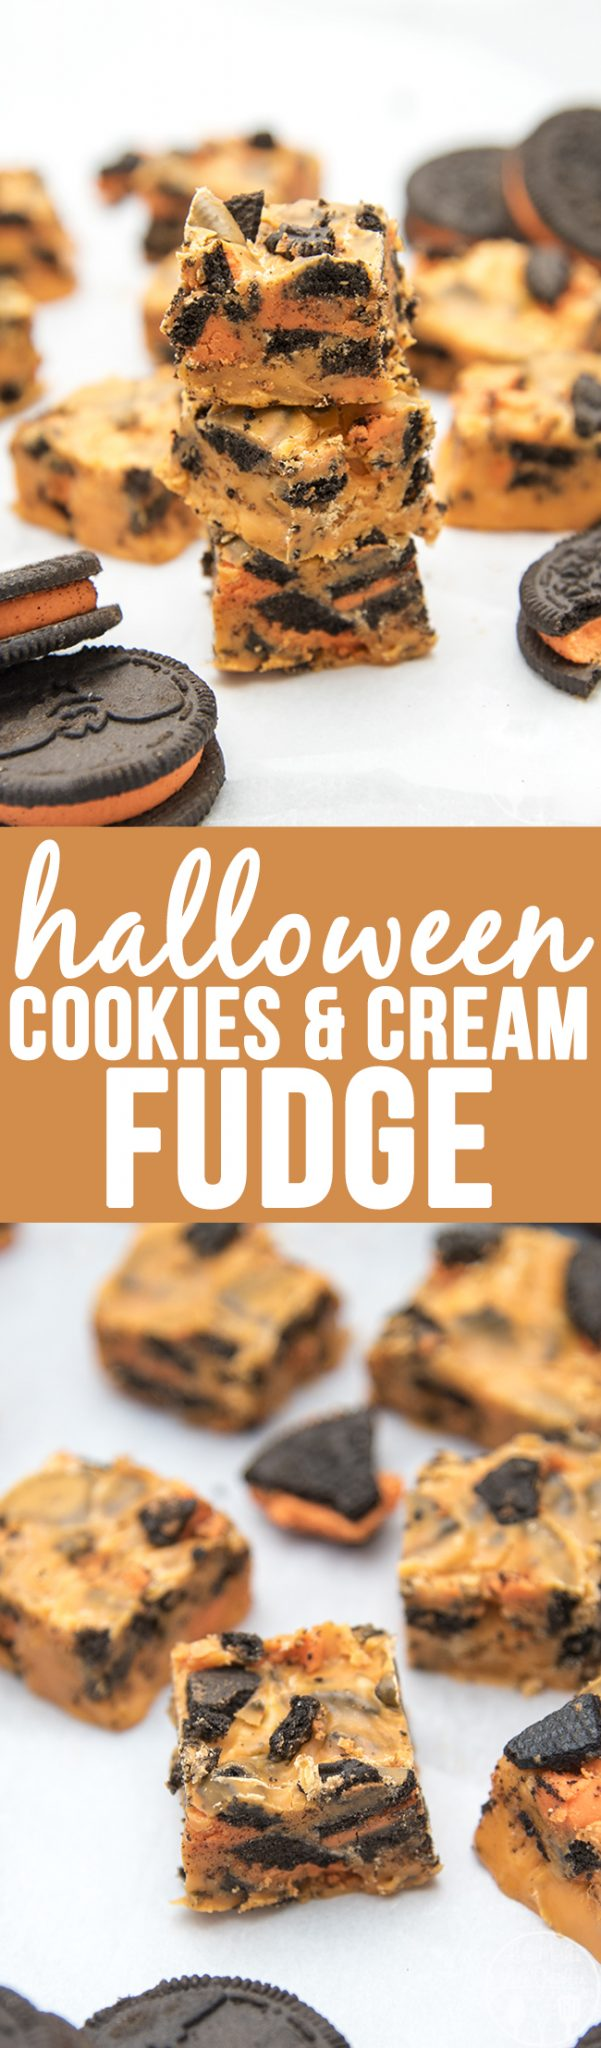 Ialloween Cookies and Cream Fudge - This 4 ingredient cookies and cream fudge is perfectly creamy and stuffed full of chunks of oreo cookies. Dyed orange to make it fun and festive for Halloween!